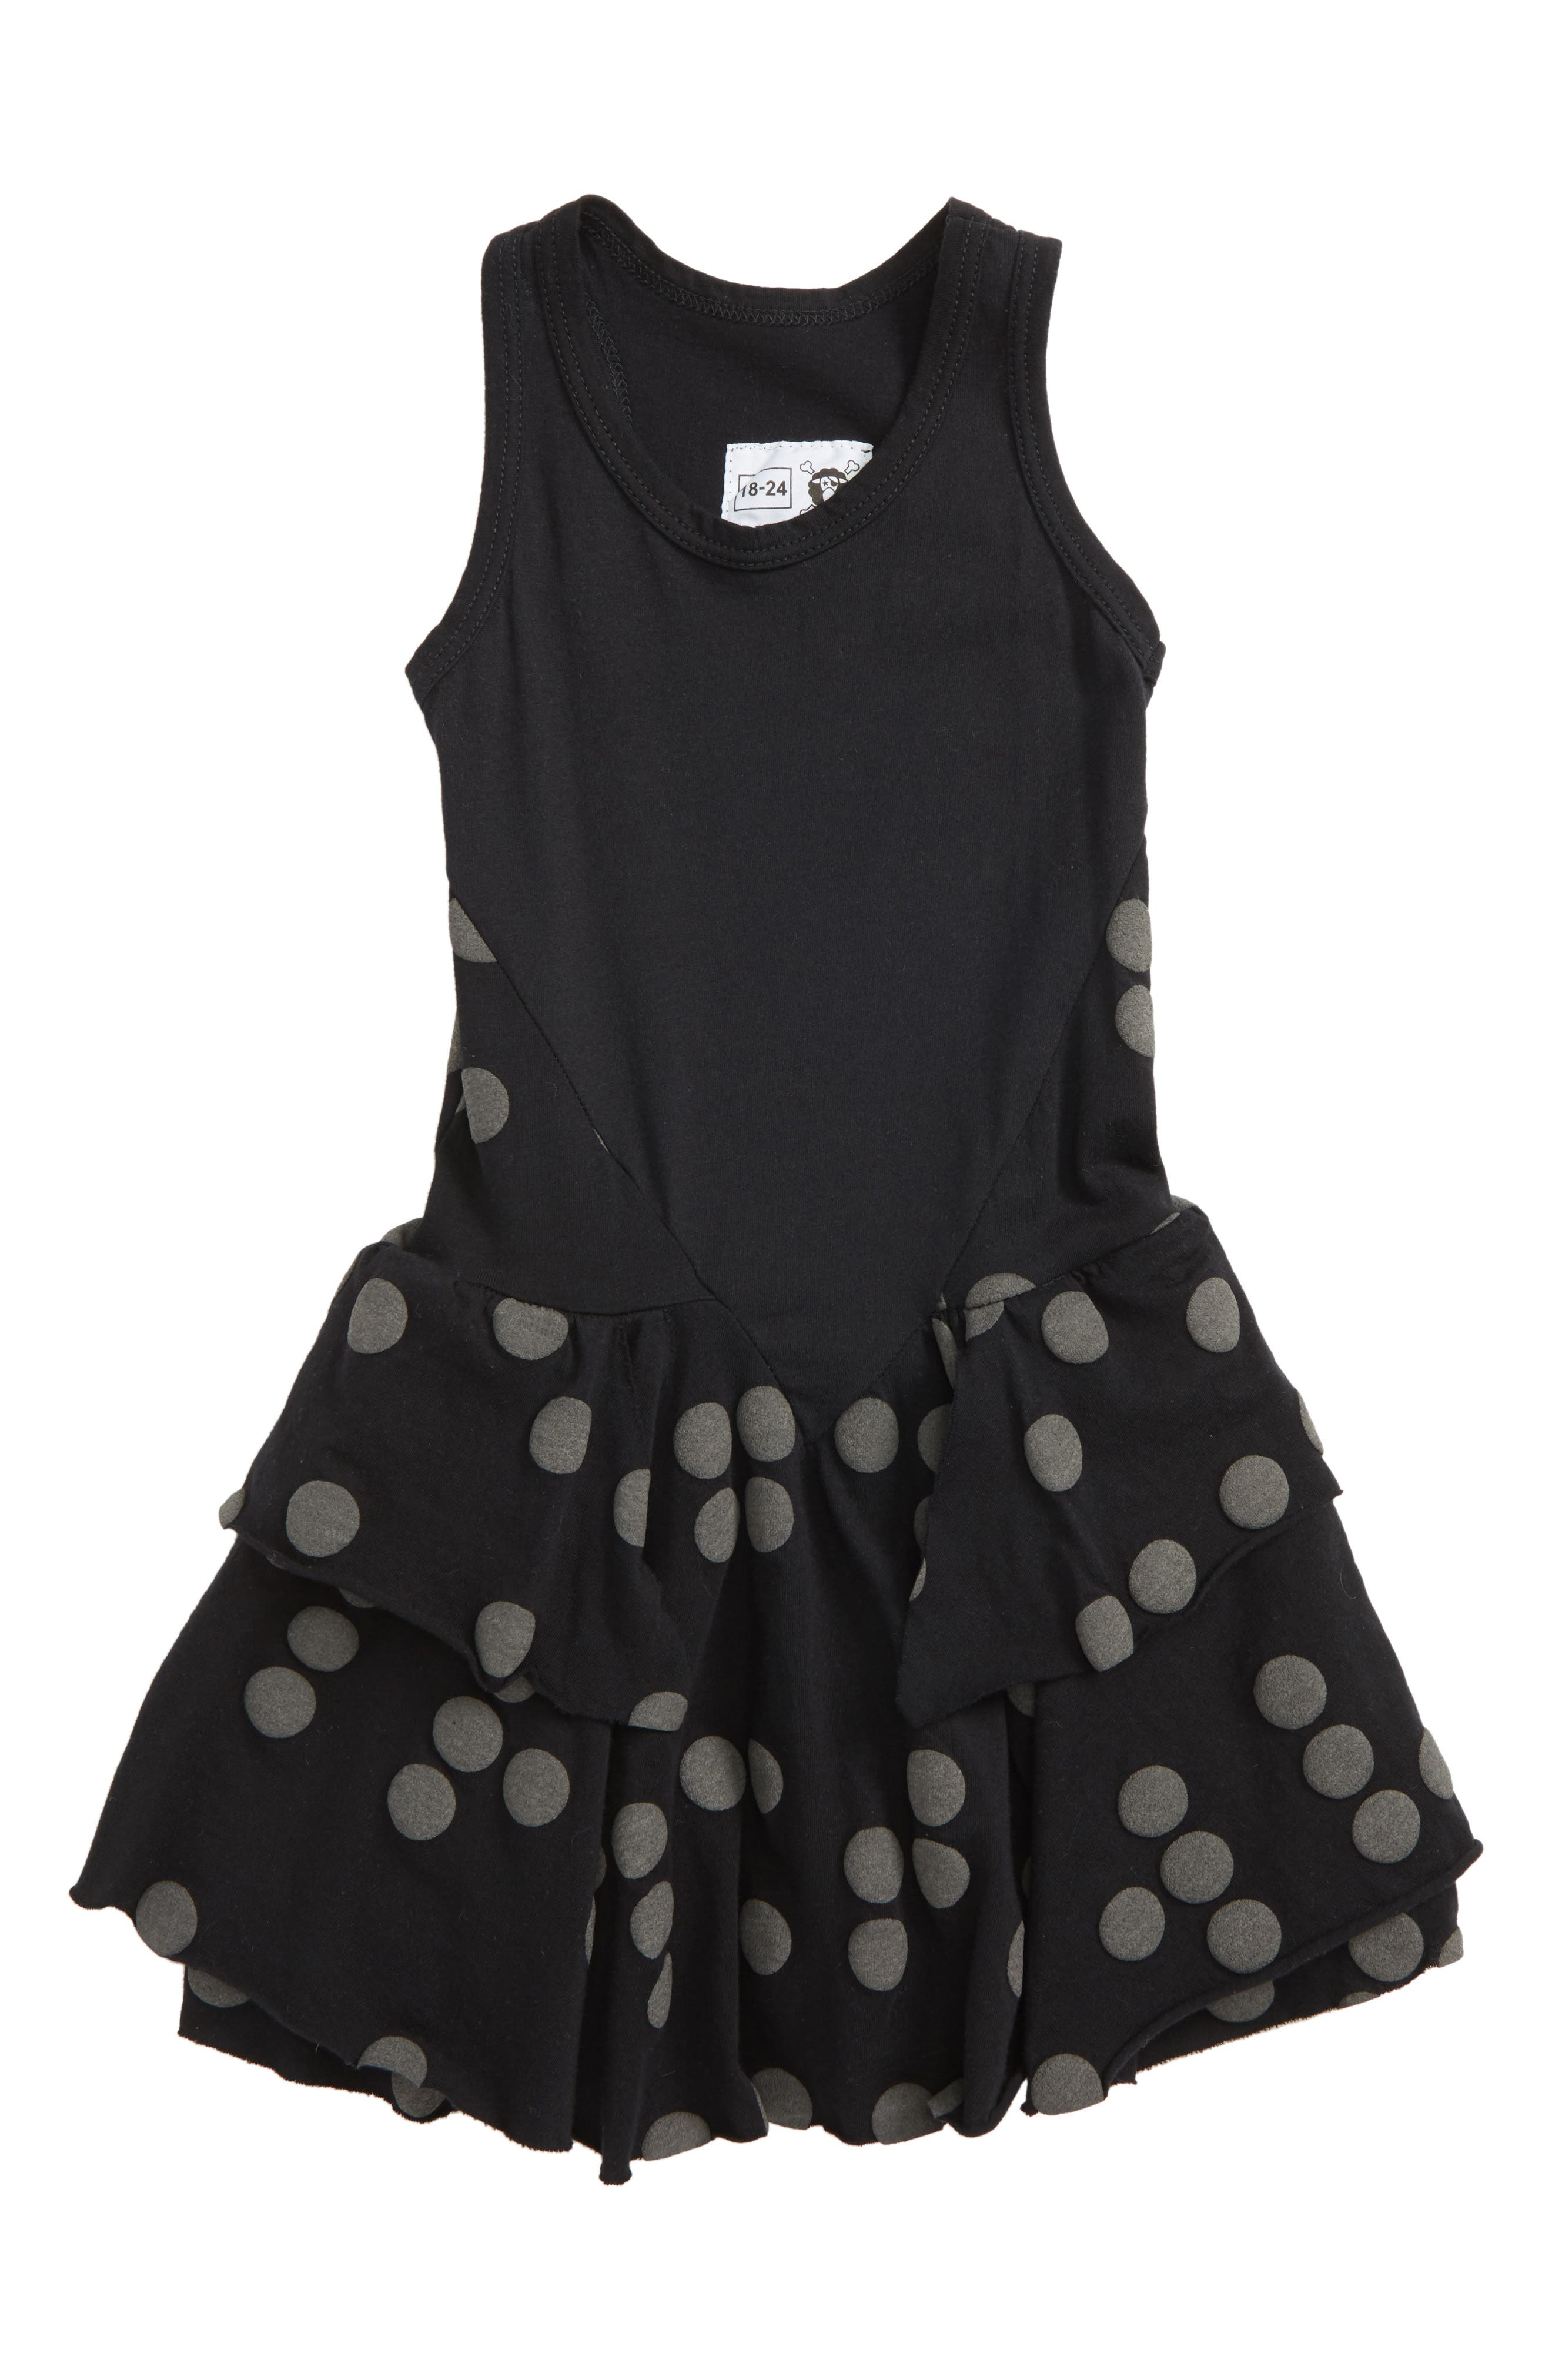 Braille Dot Layered Tank Dress,                             Main thumbnail 1, color,                             001